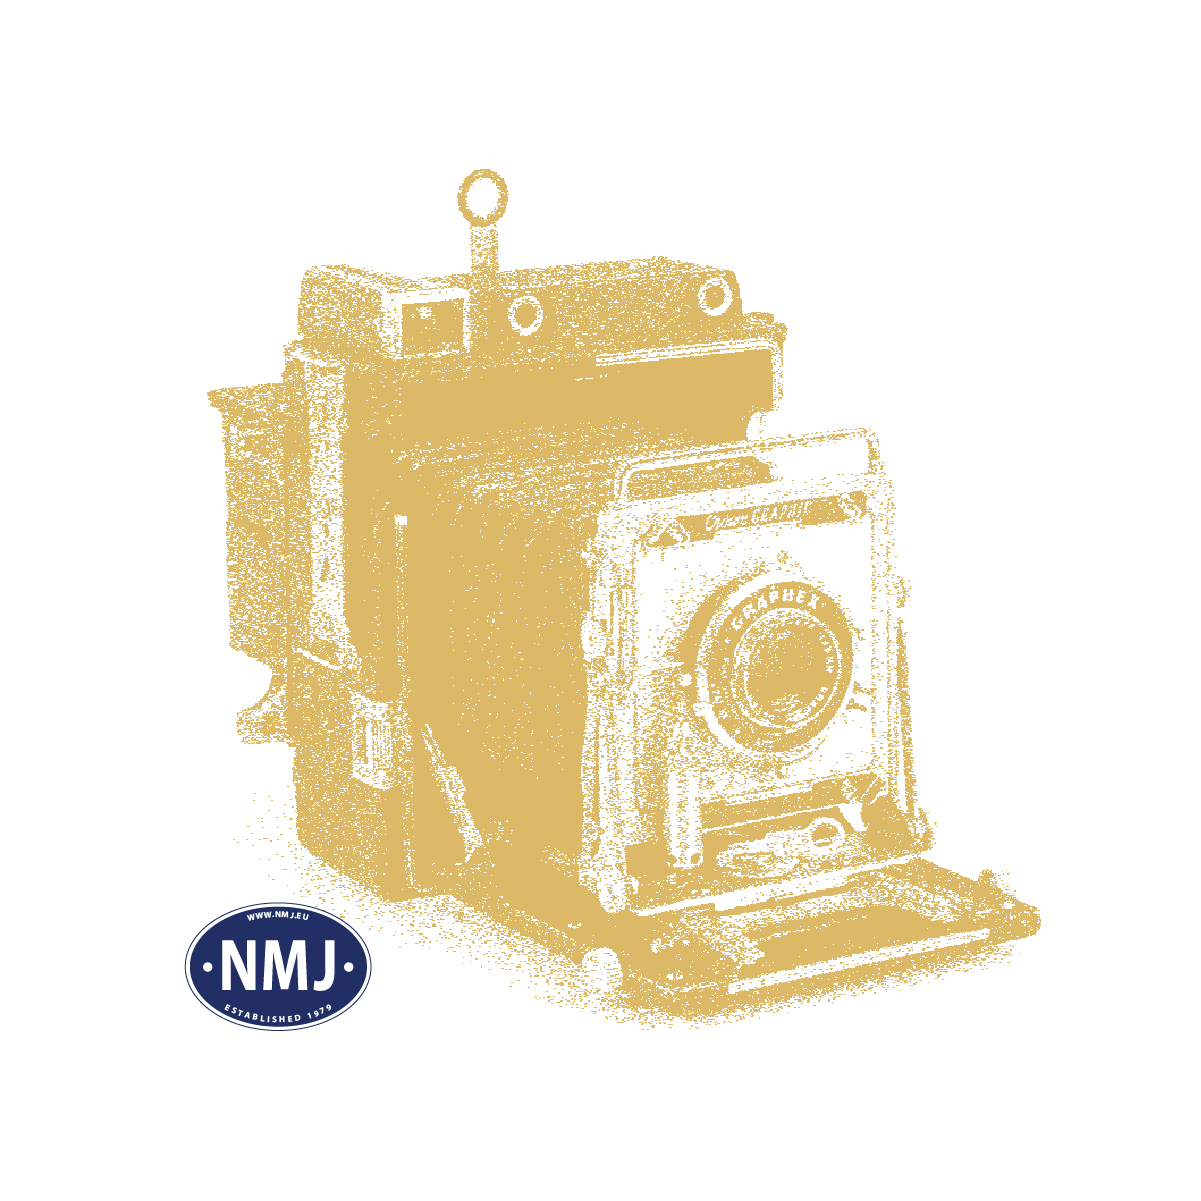 ROC40198 - 40198 NEM Likestrømstrømshjul, 11 mm, 2 stk